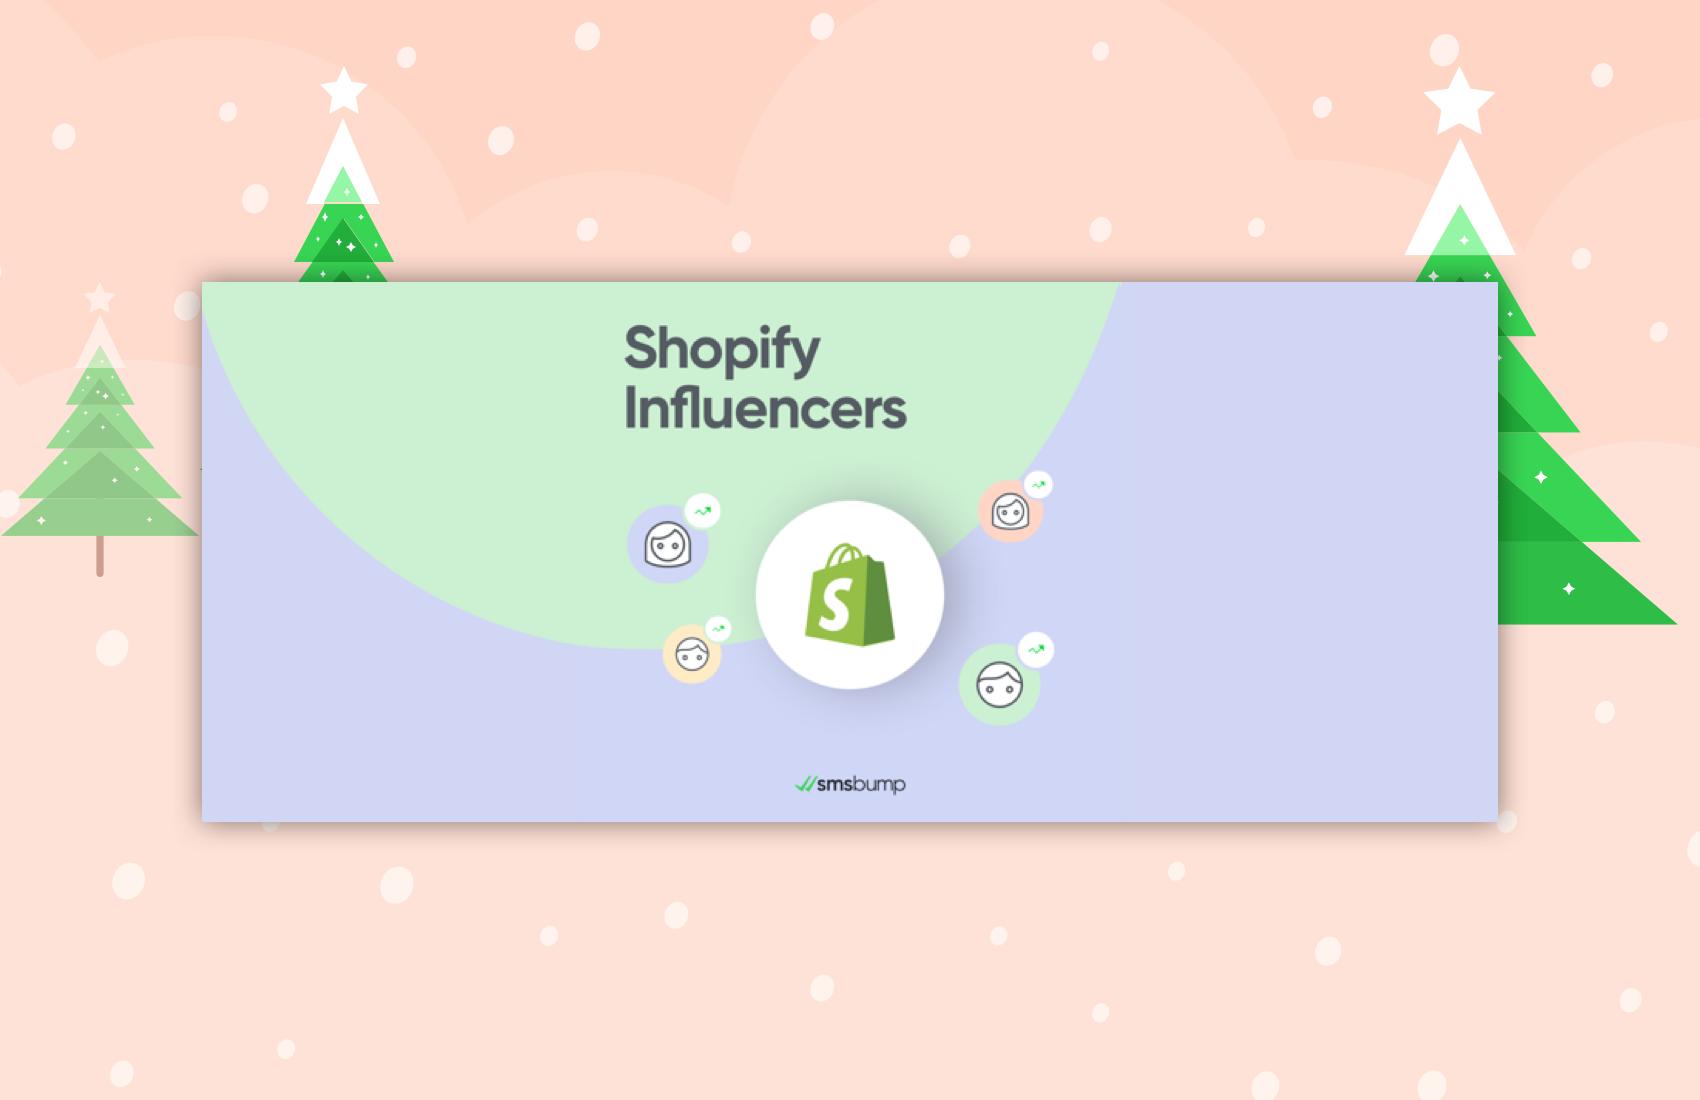 influencers-shopify-smsbump